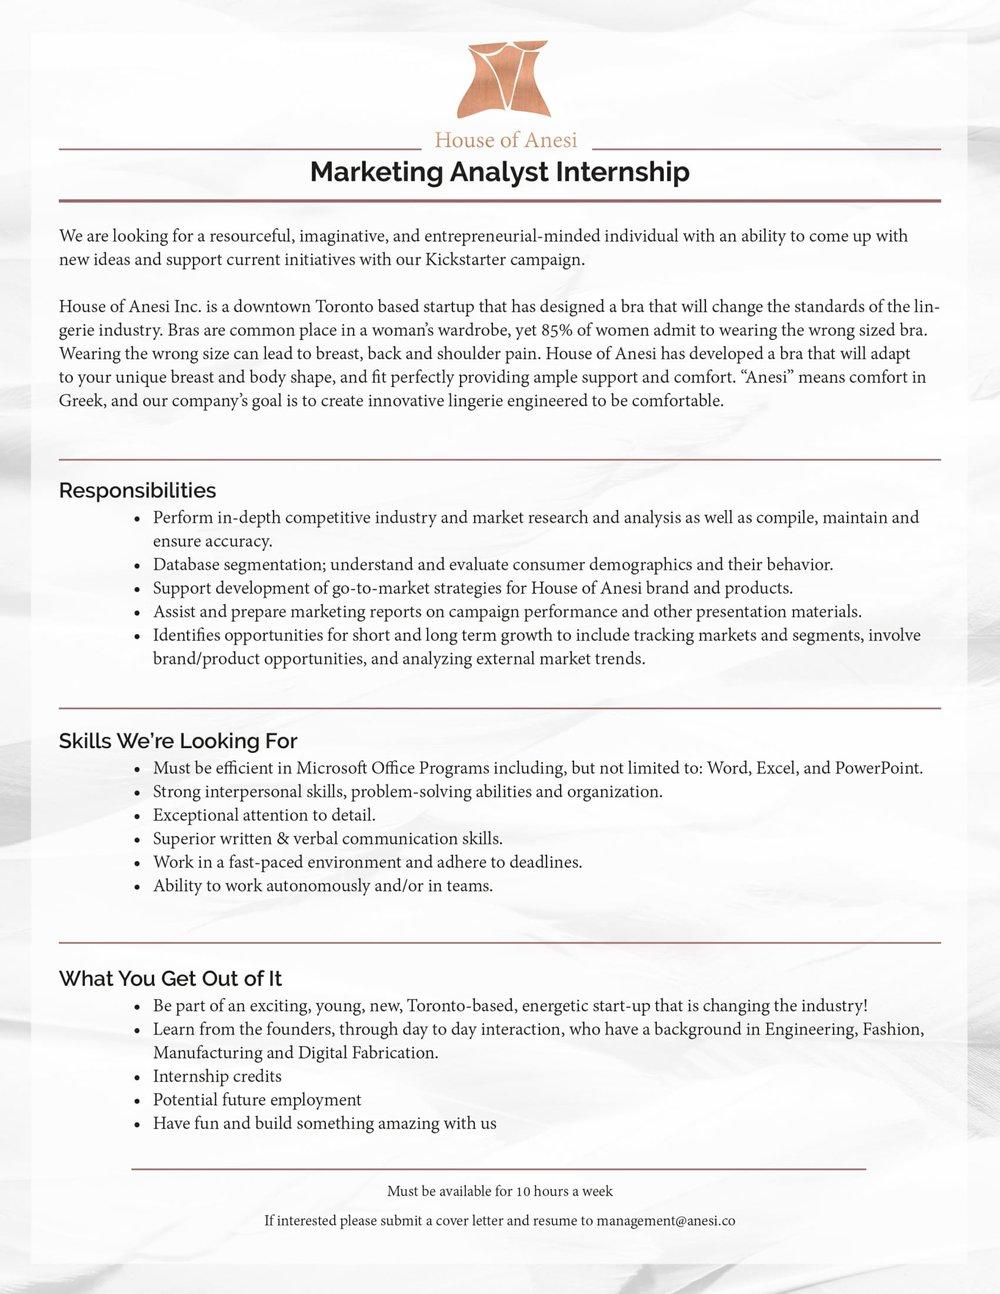 marketinganalystinternformfinal-1.jpg